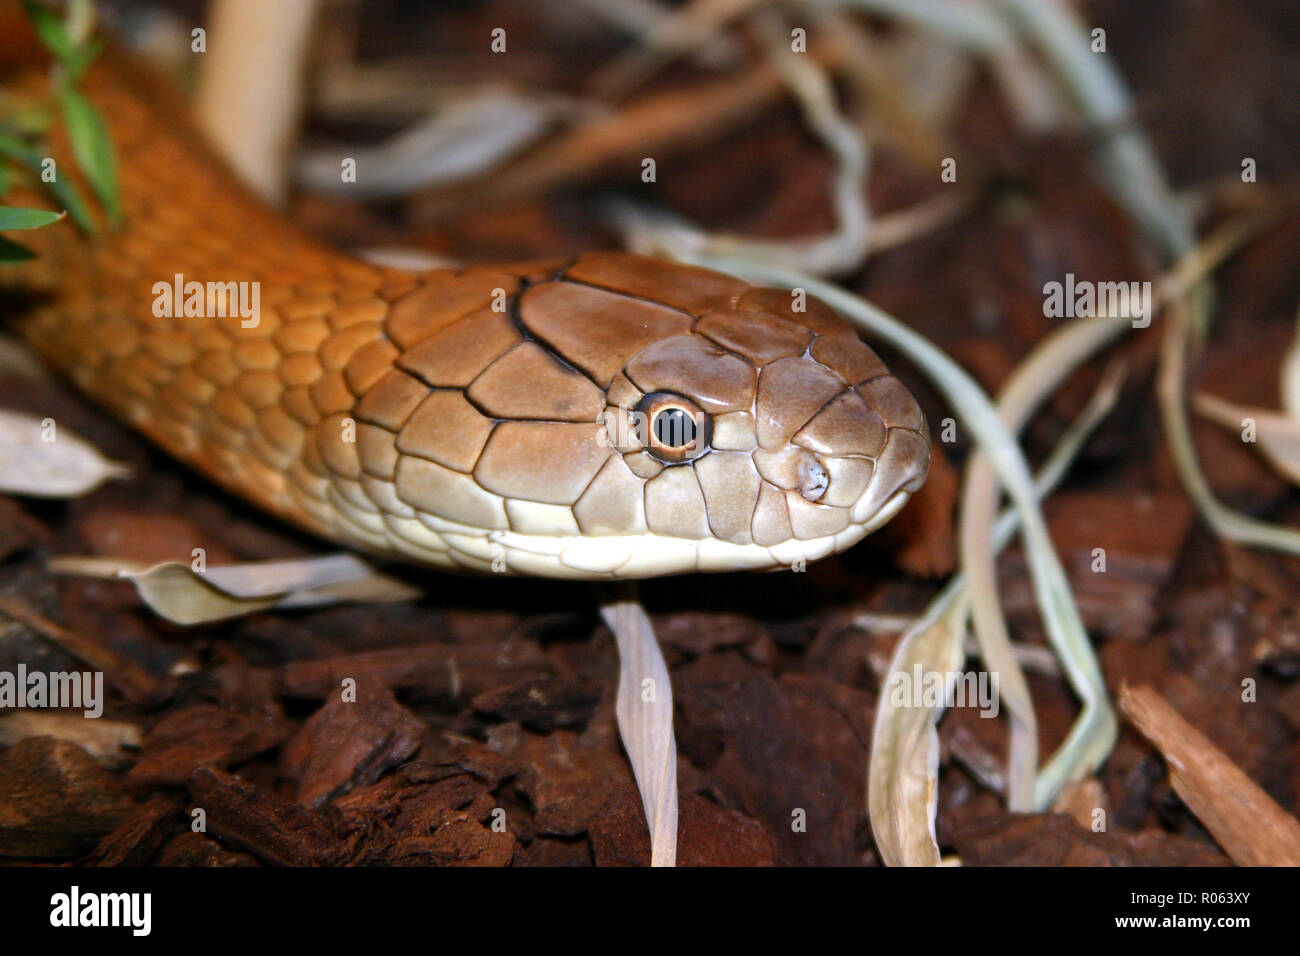 Elapidae, venomous snake - Stock Image